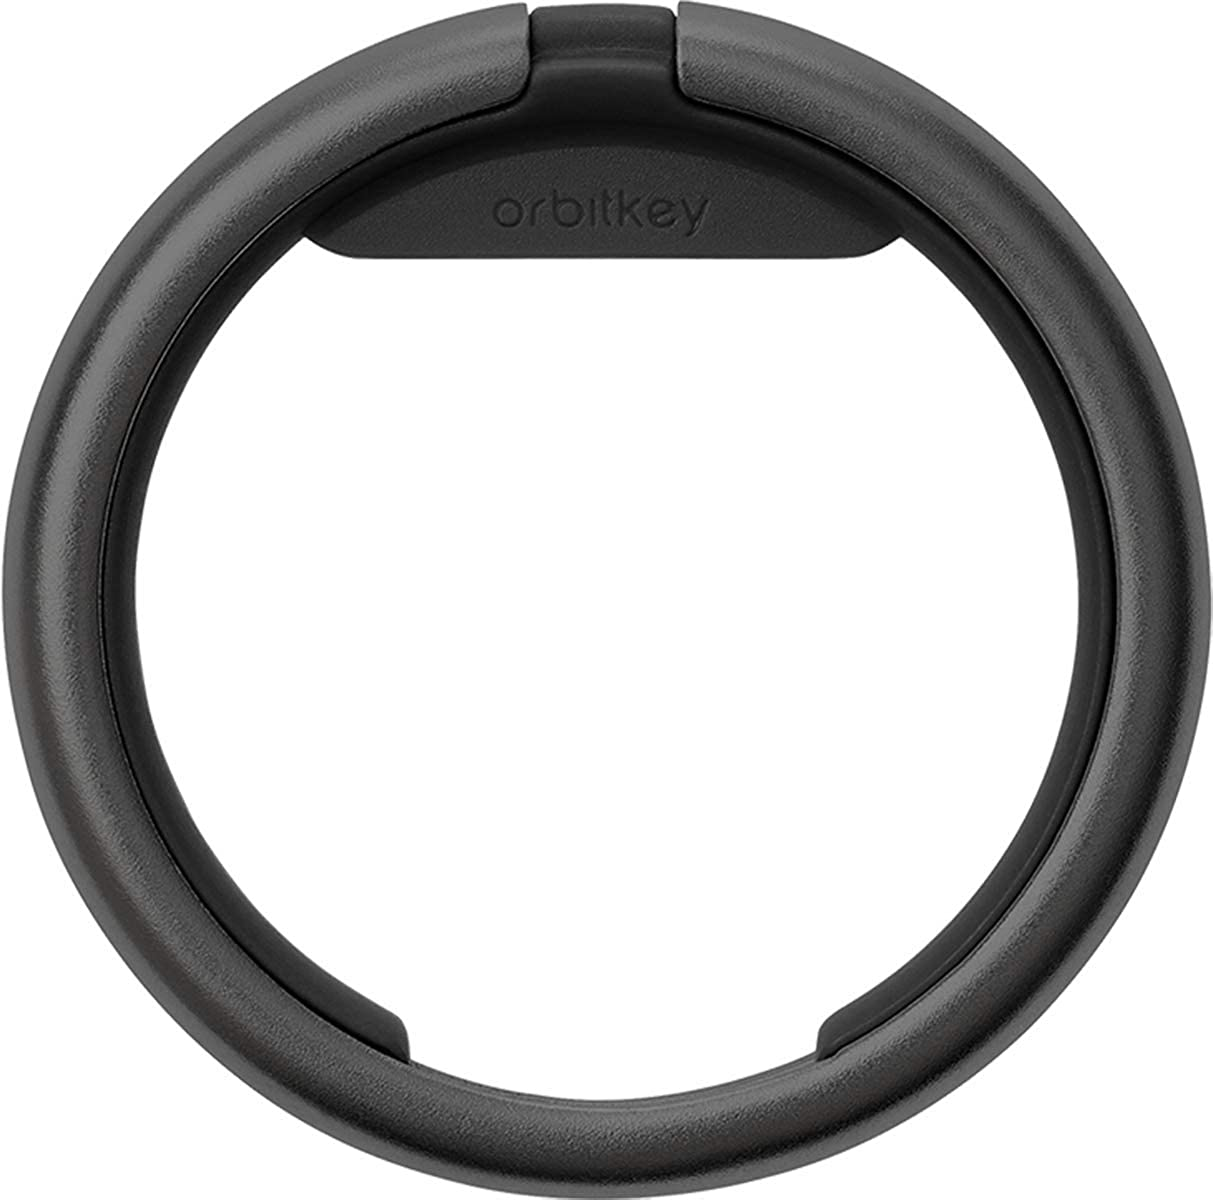 Orbitkey Key Ring | Durable Stainless Steel, Effortless Attaching & Detaching Key Organizer | Holds up to 10 Keys